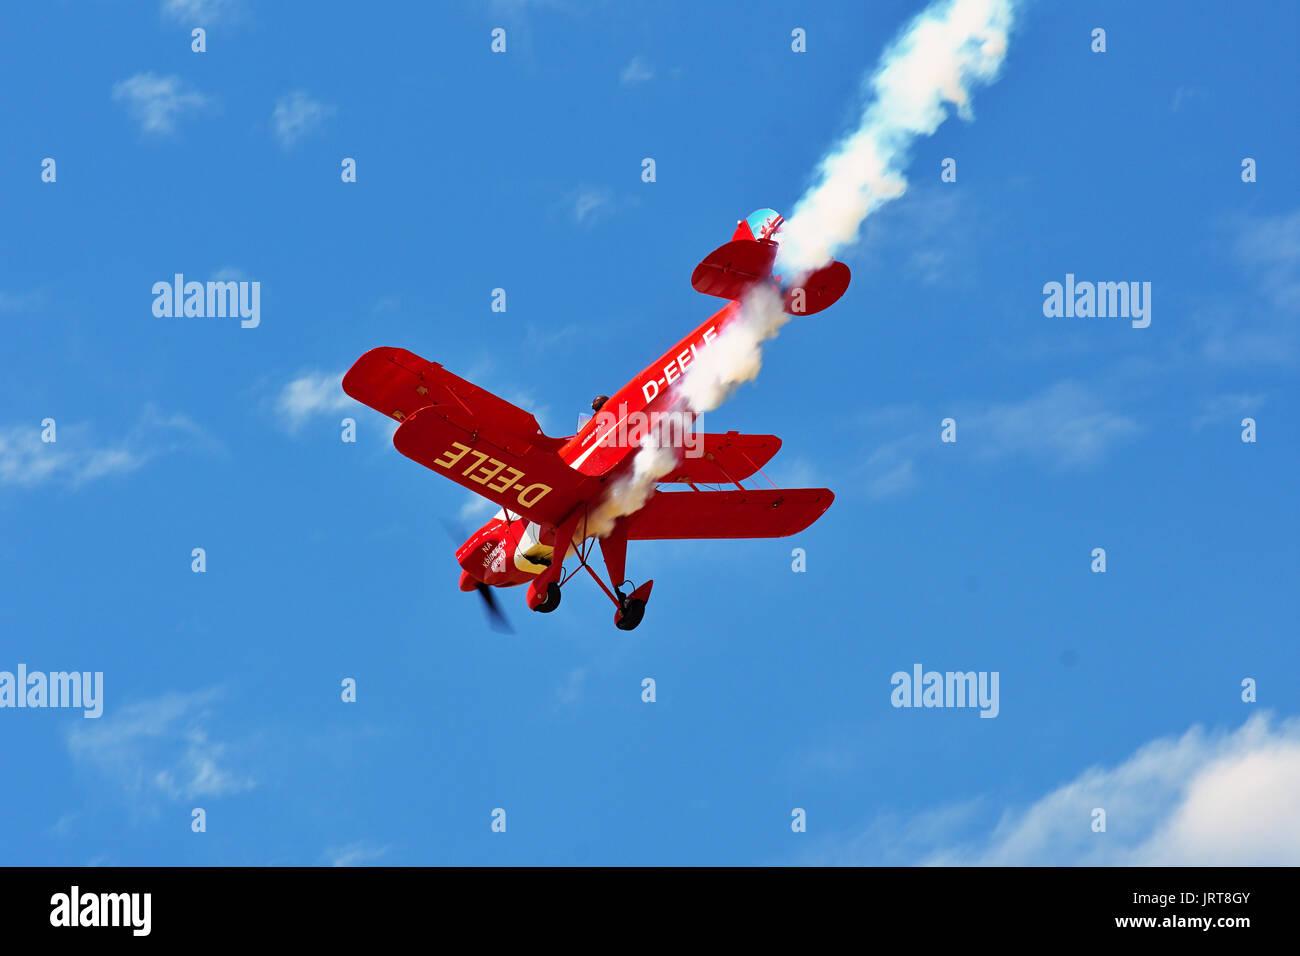 Memorial Airshow, 24th of June 2017, Roudnice, Czech Republic. Bucker Jungmeister in flight, smoke effect - Stock Image